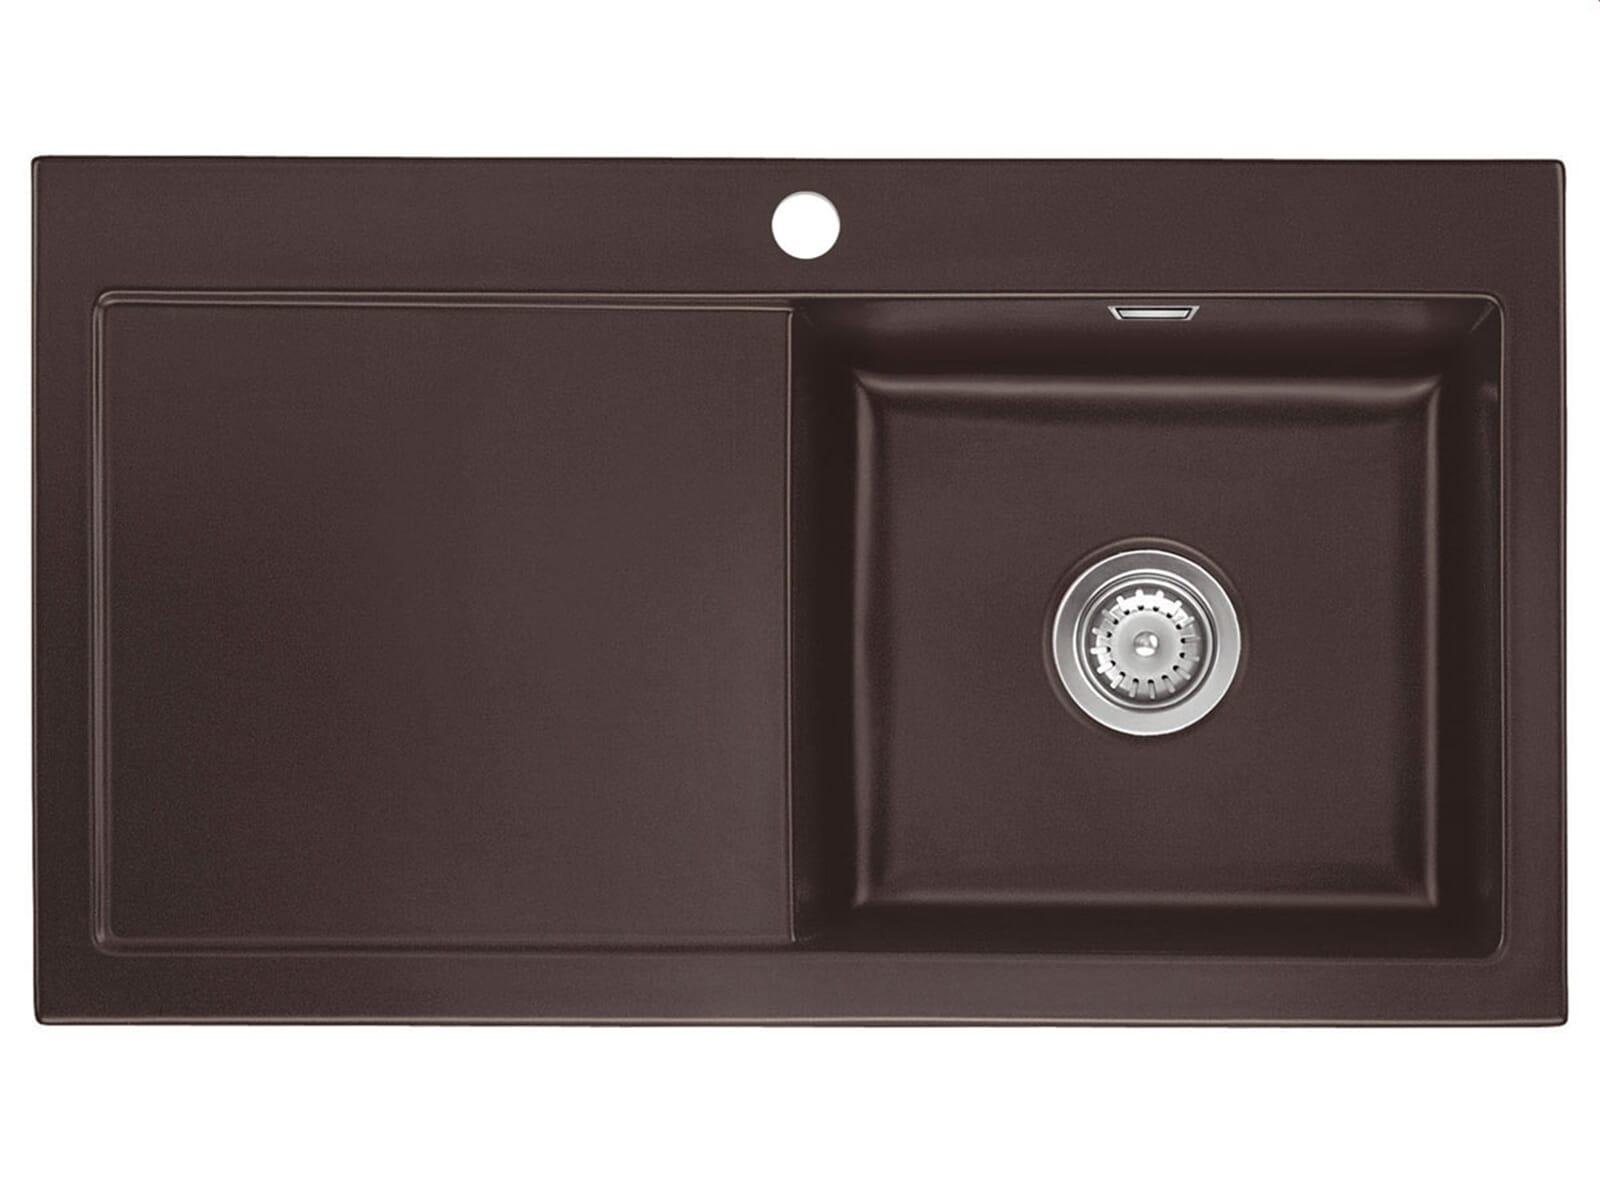 systemceram mera 90 siena keramiksp le handbet tigung. Black Bedroom Furniture Sets. Home Design Ideas